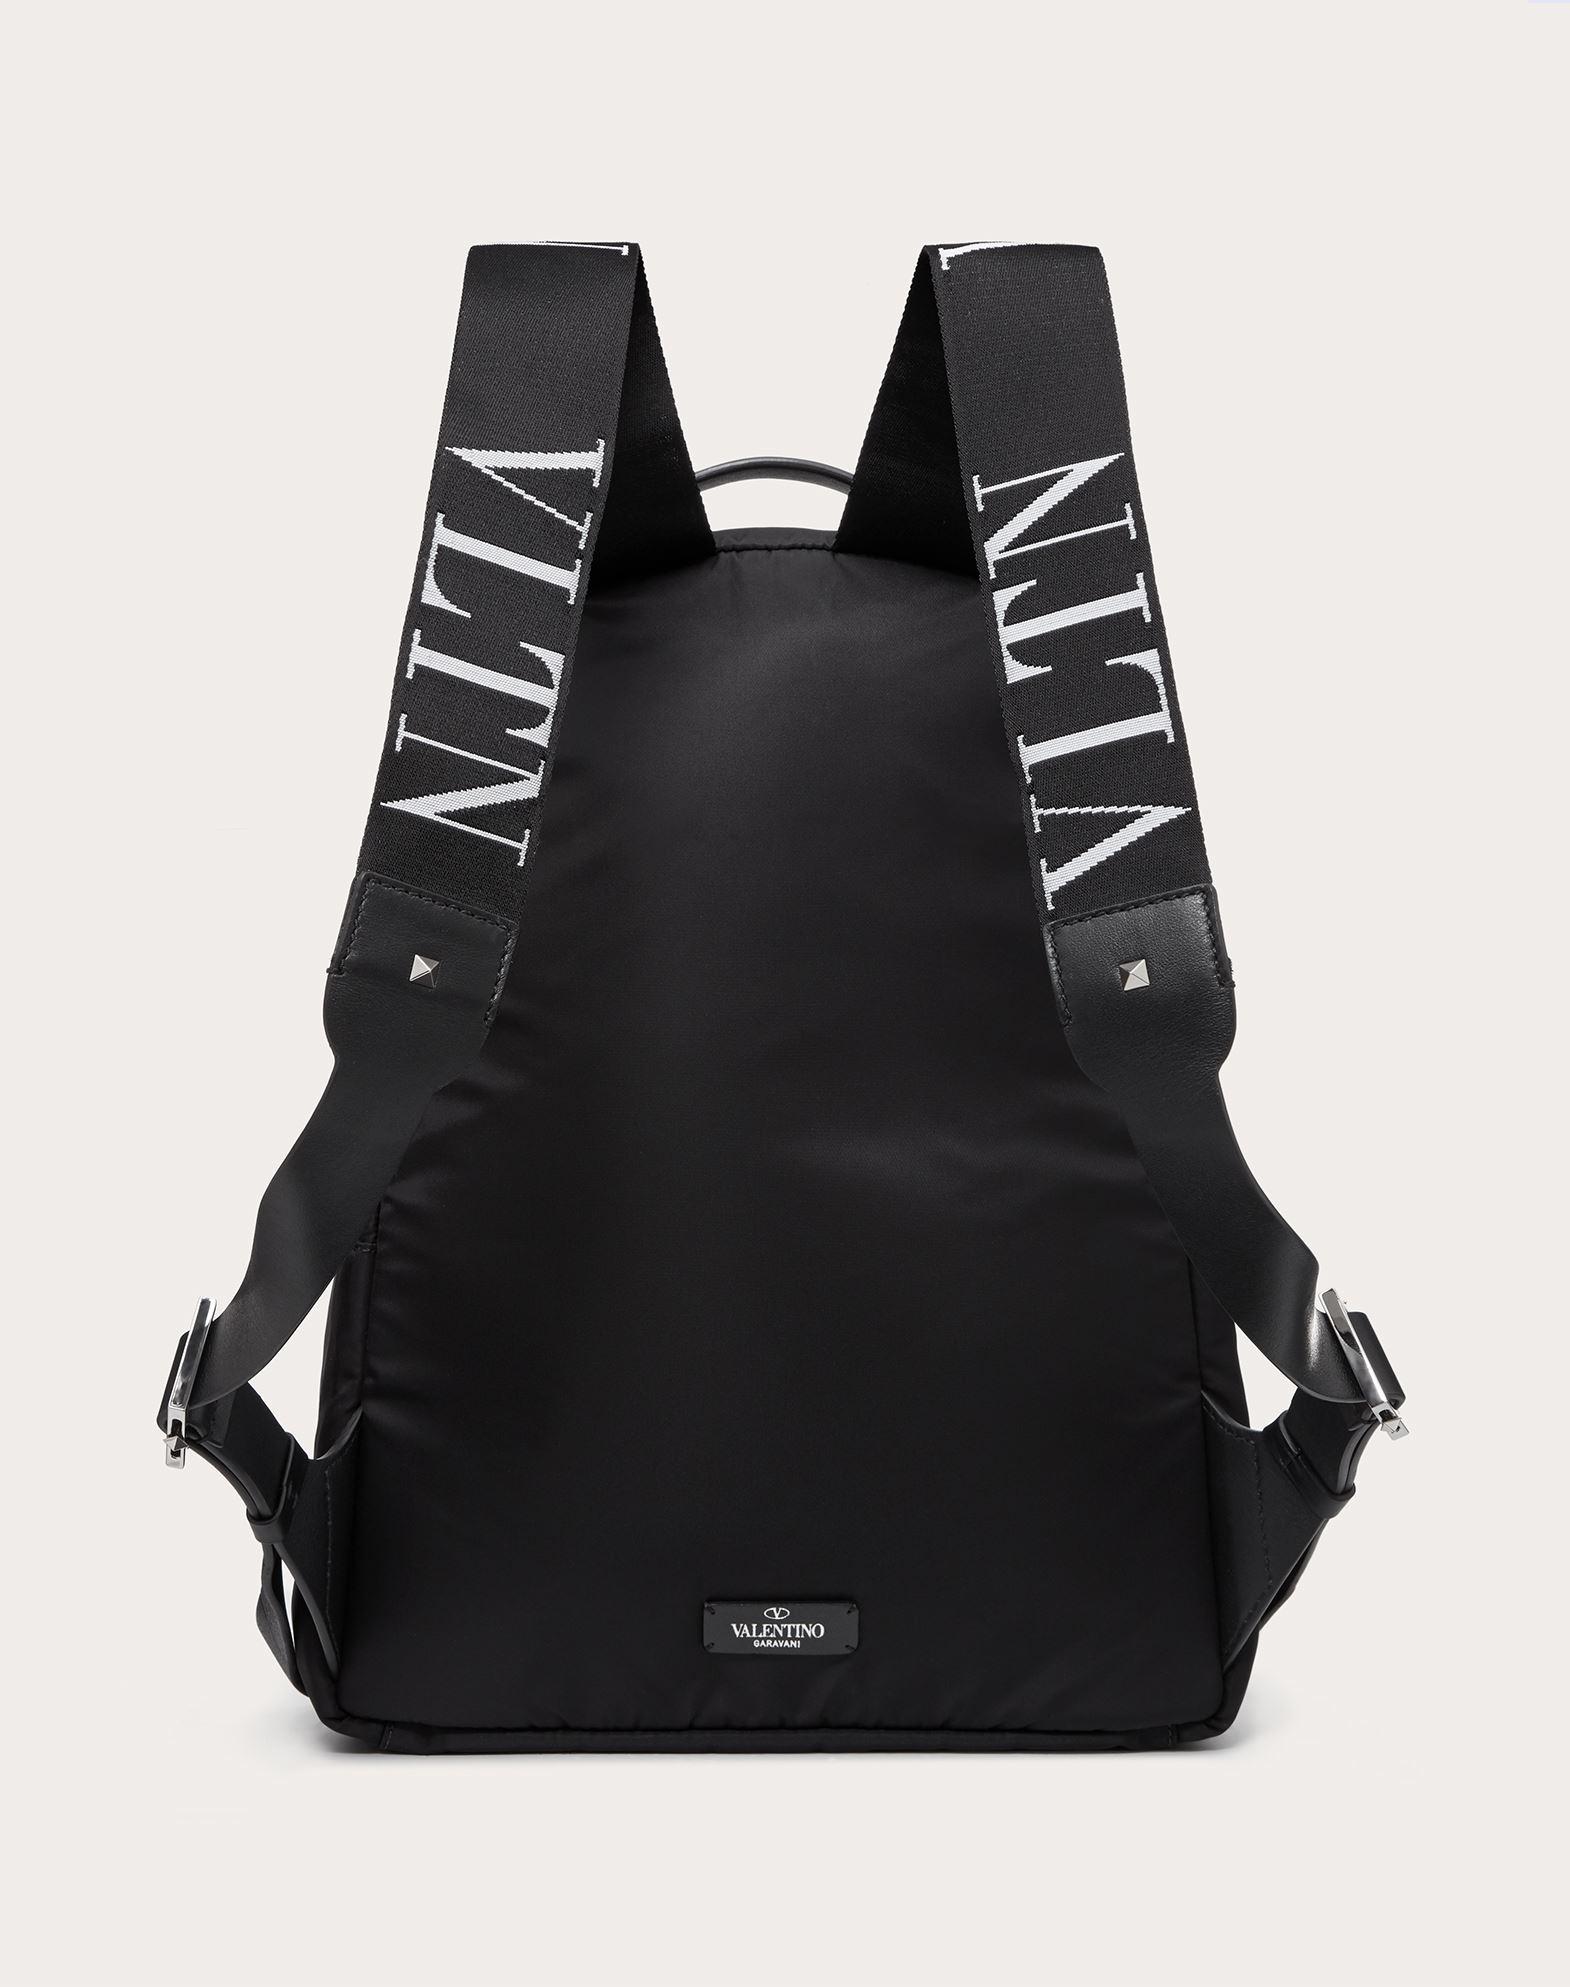 VALENTINO GARAVANI UOMO VLTN backpack Rucksack U d